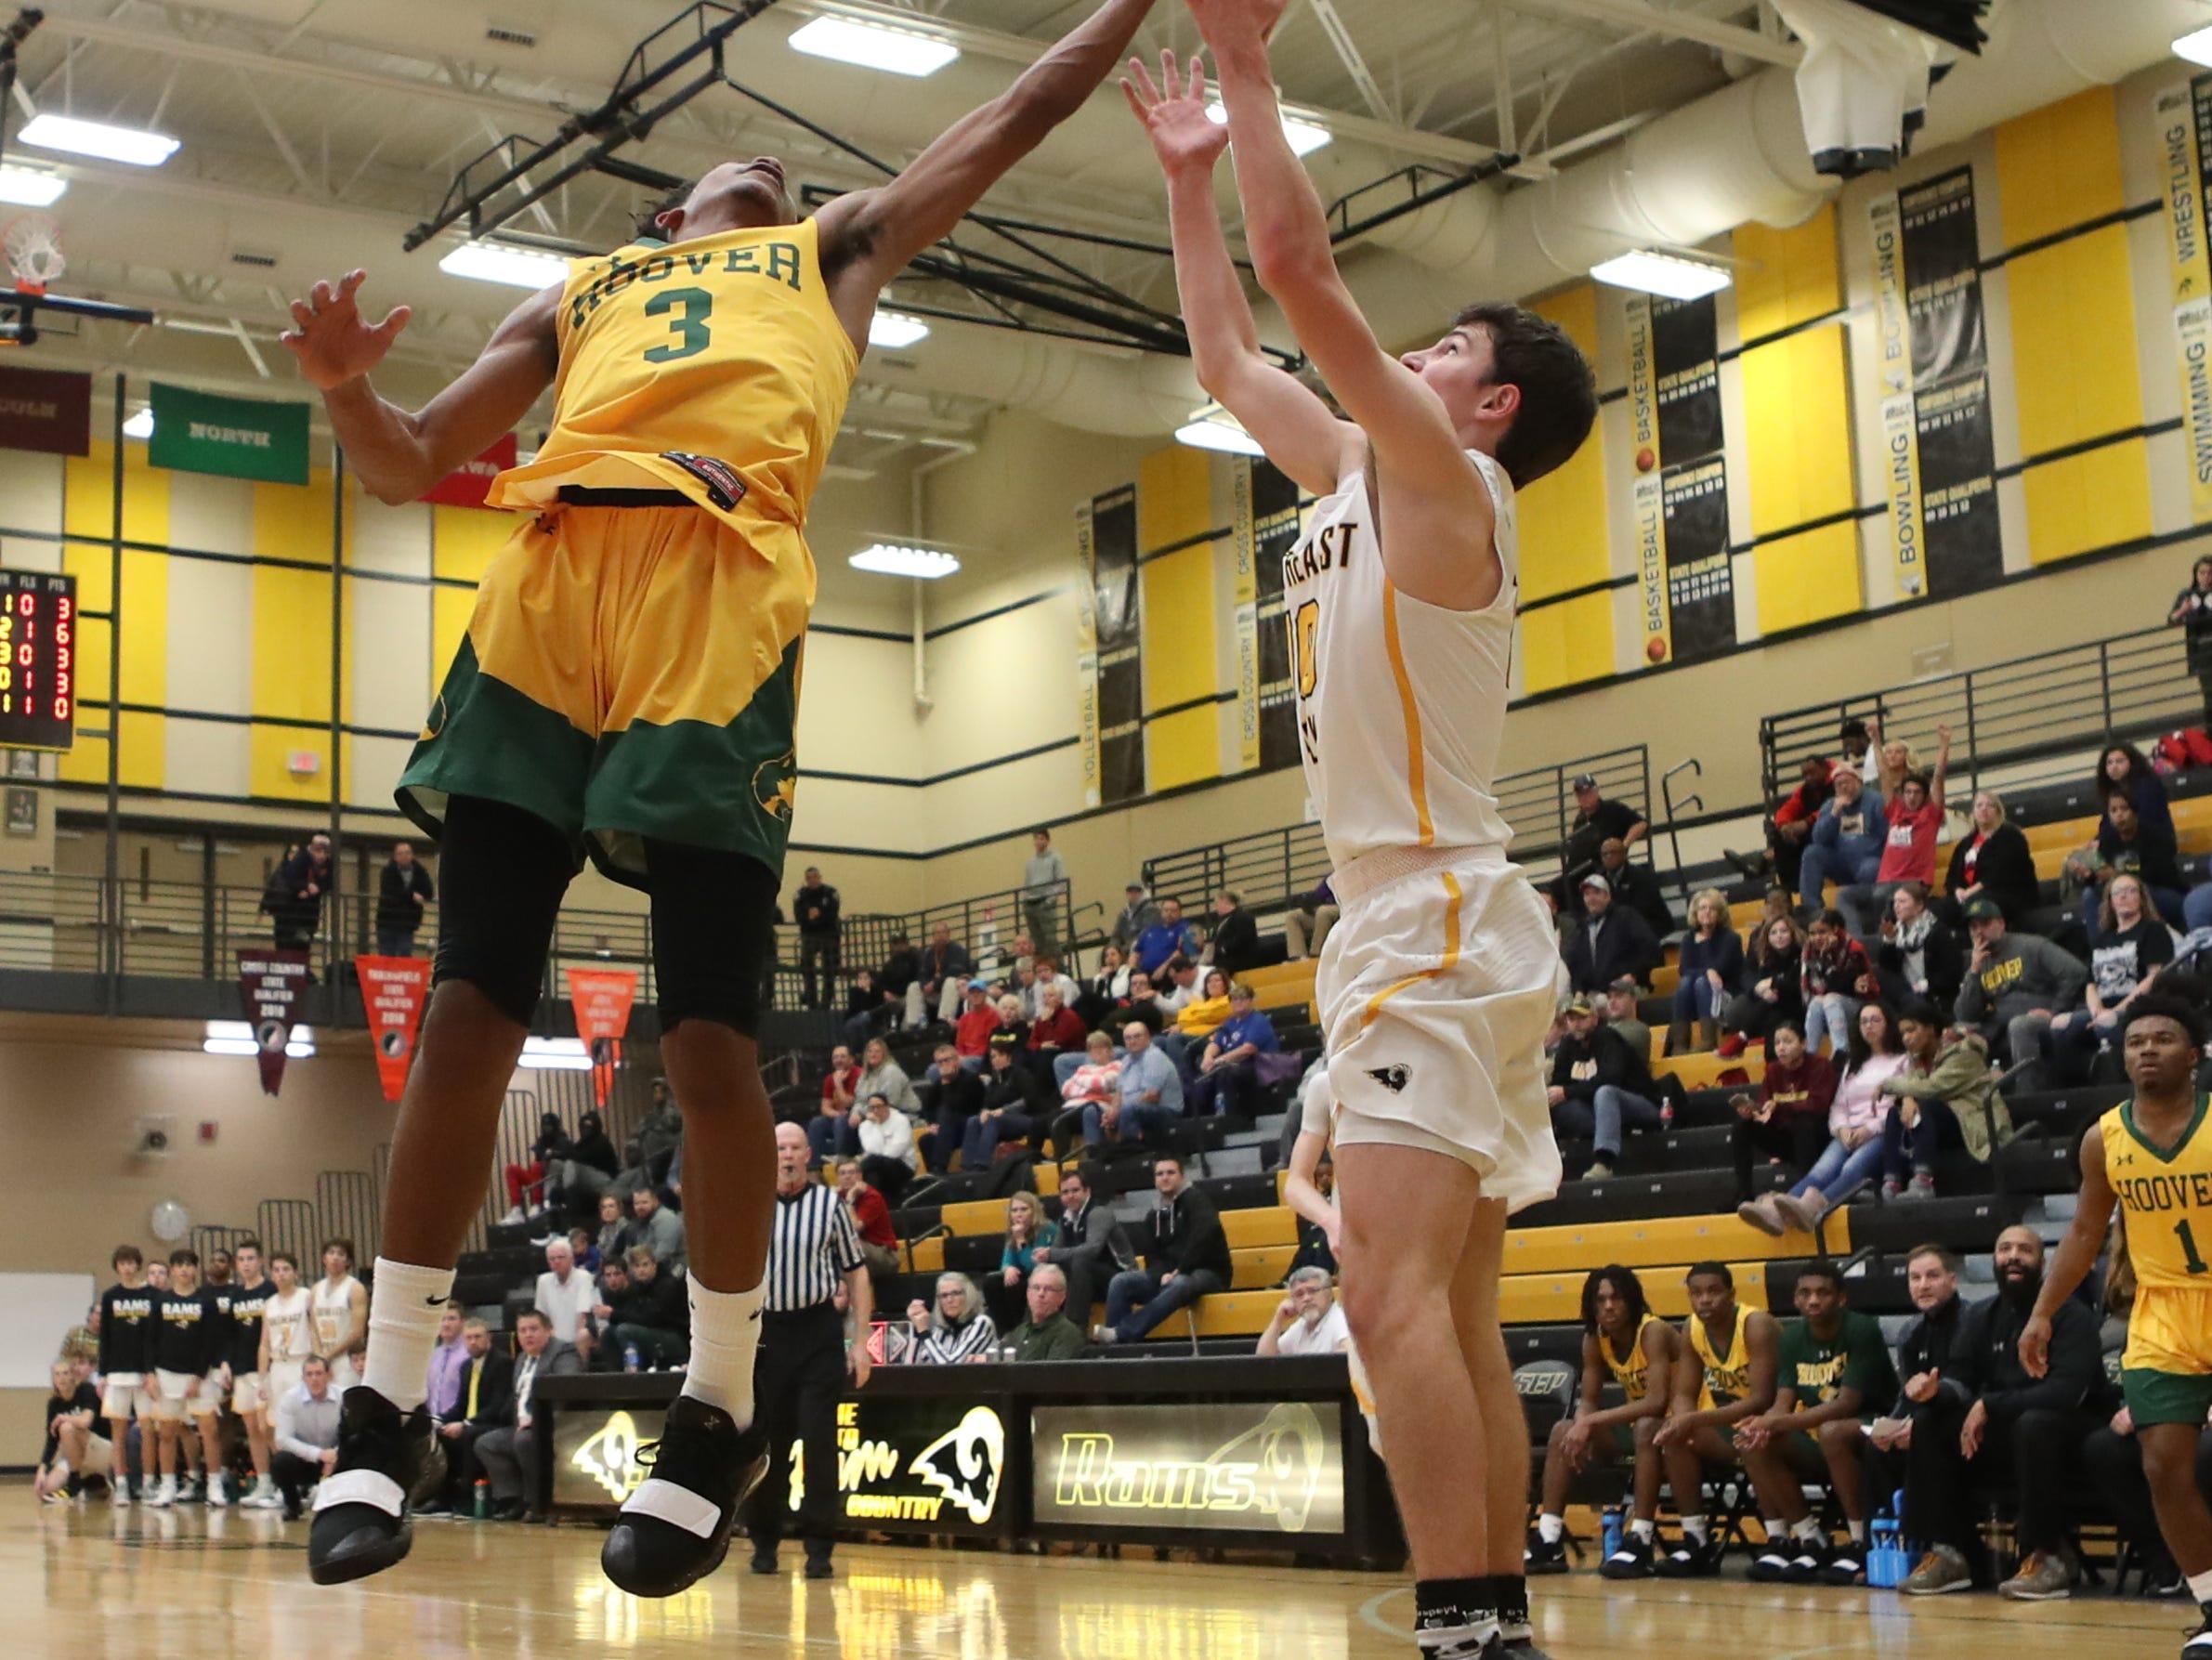 Hoover Huskies Hosea Treadwell (3) out jumps Southeast Polk Rams Daniel Hackbarth (10) for a rebound at Southeast Polk High School.